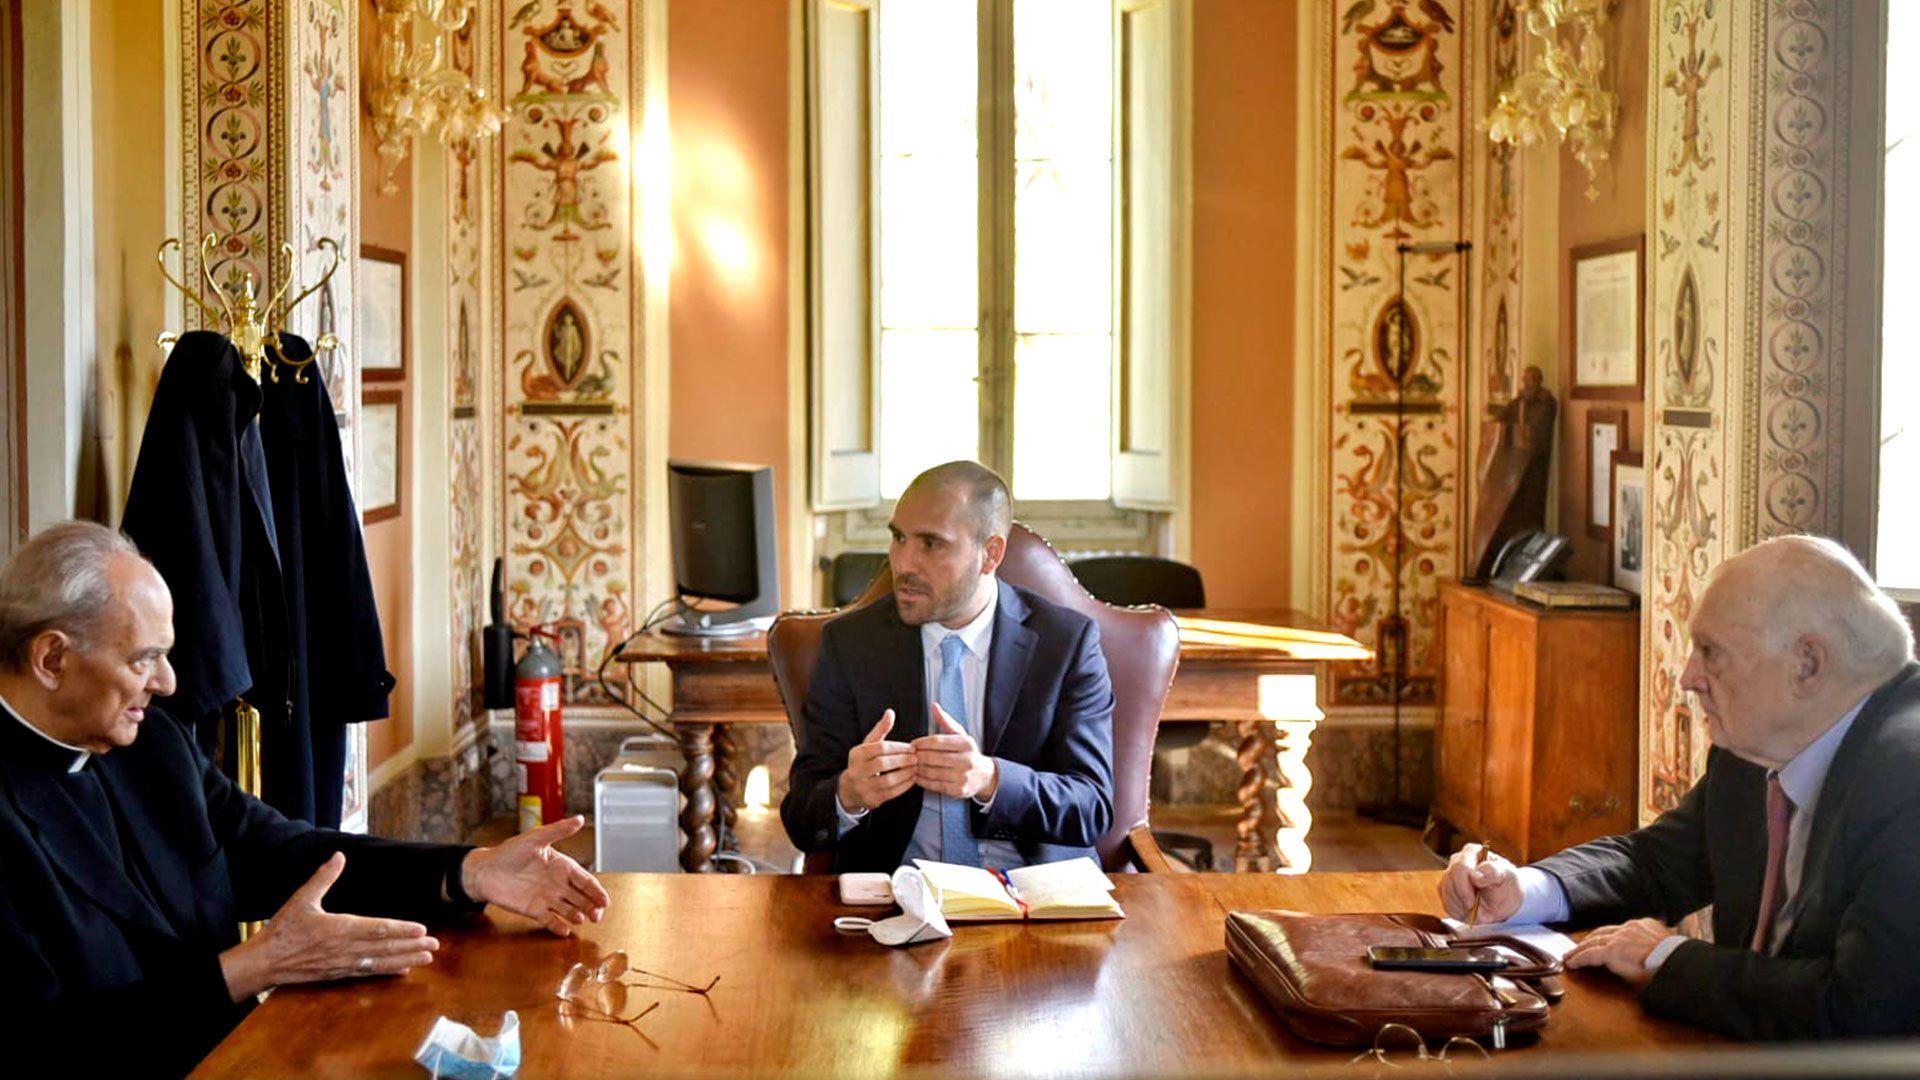 Martin-Guzman-con-empresarios-en-Italia